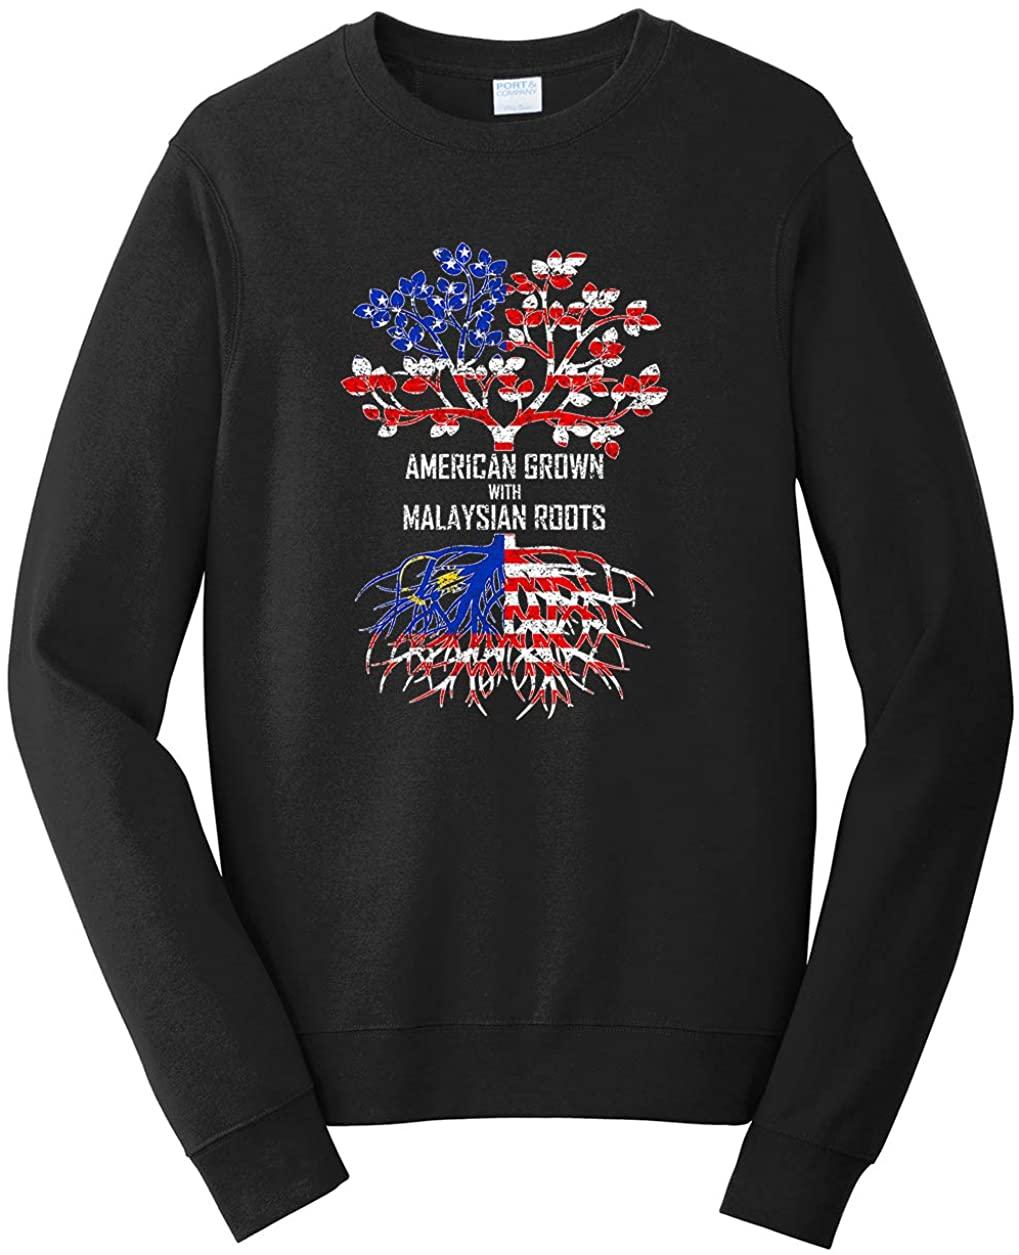 Tenacitee Unisex American Grown with Malaysian Roots Sweatshirt